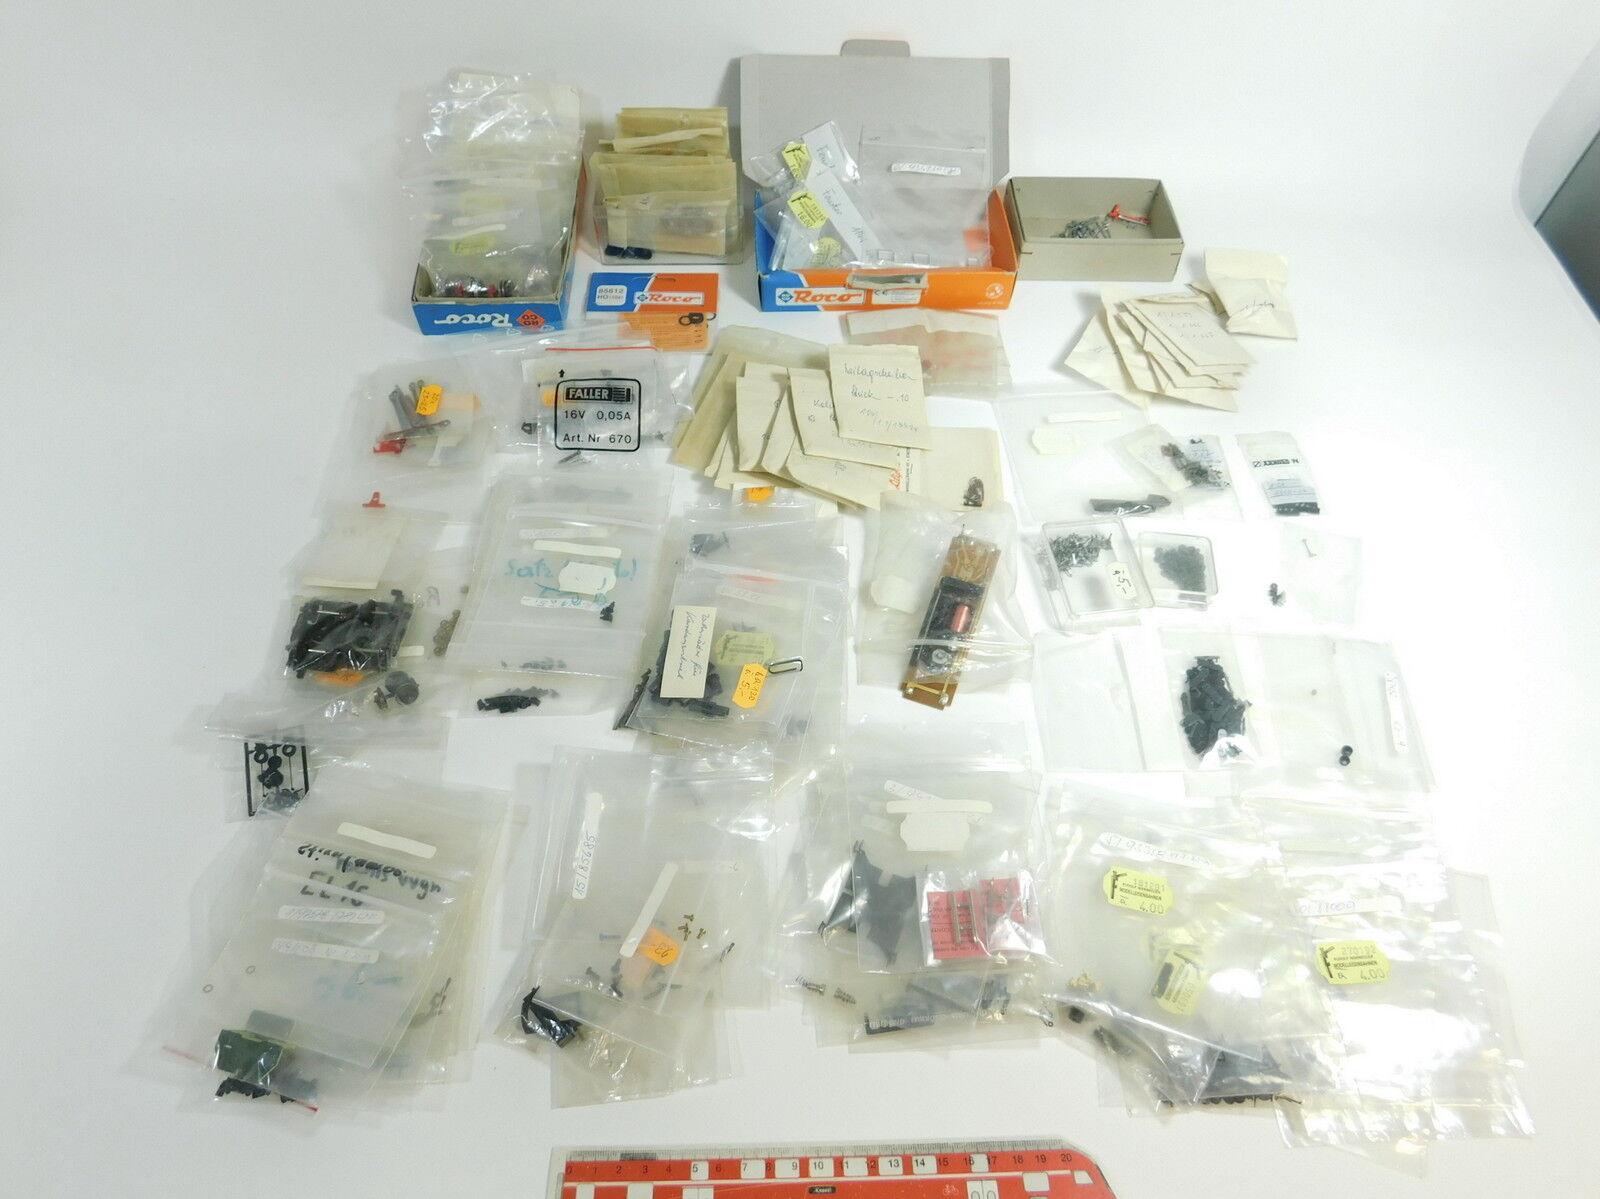 AN324-3  Konvolut H0 DC Ersatzteile (Wernegger) Roco, Rivarossi,Liliput,Lima etc  | Toy Story